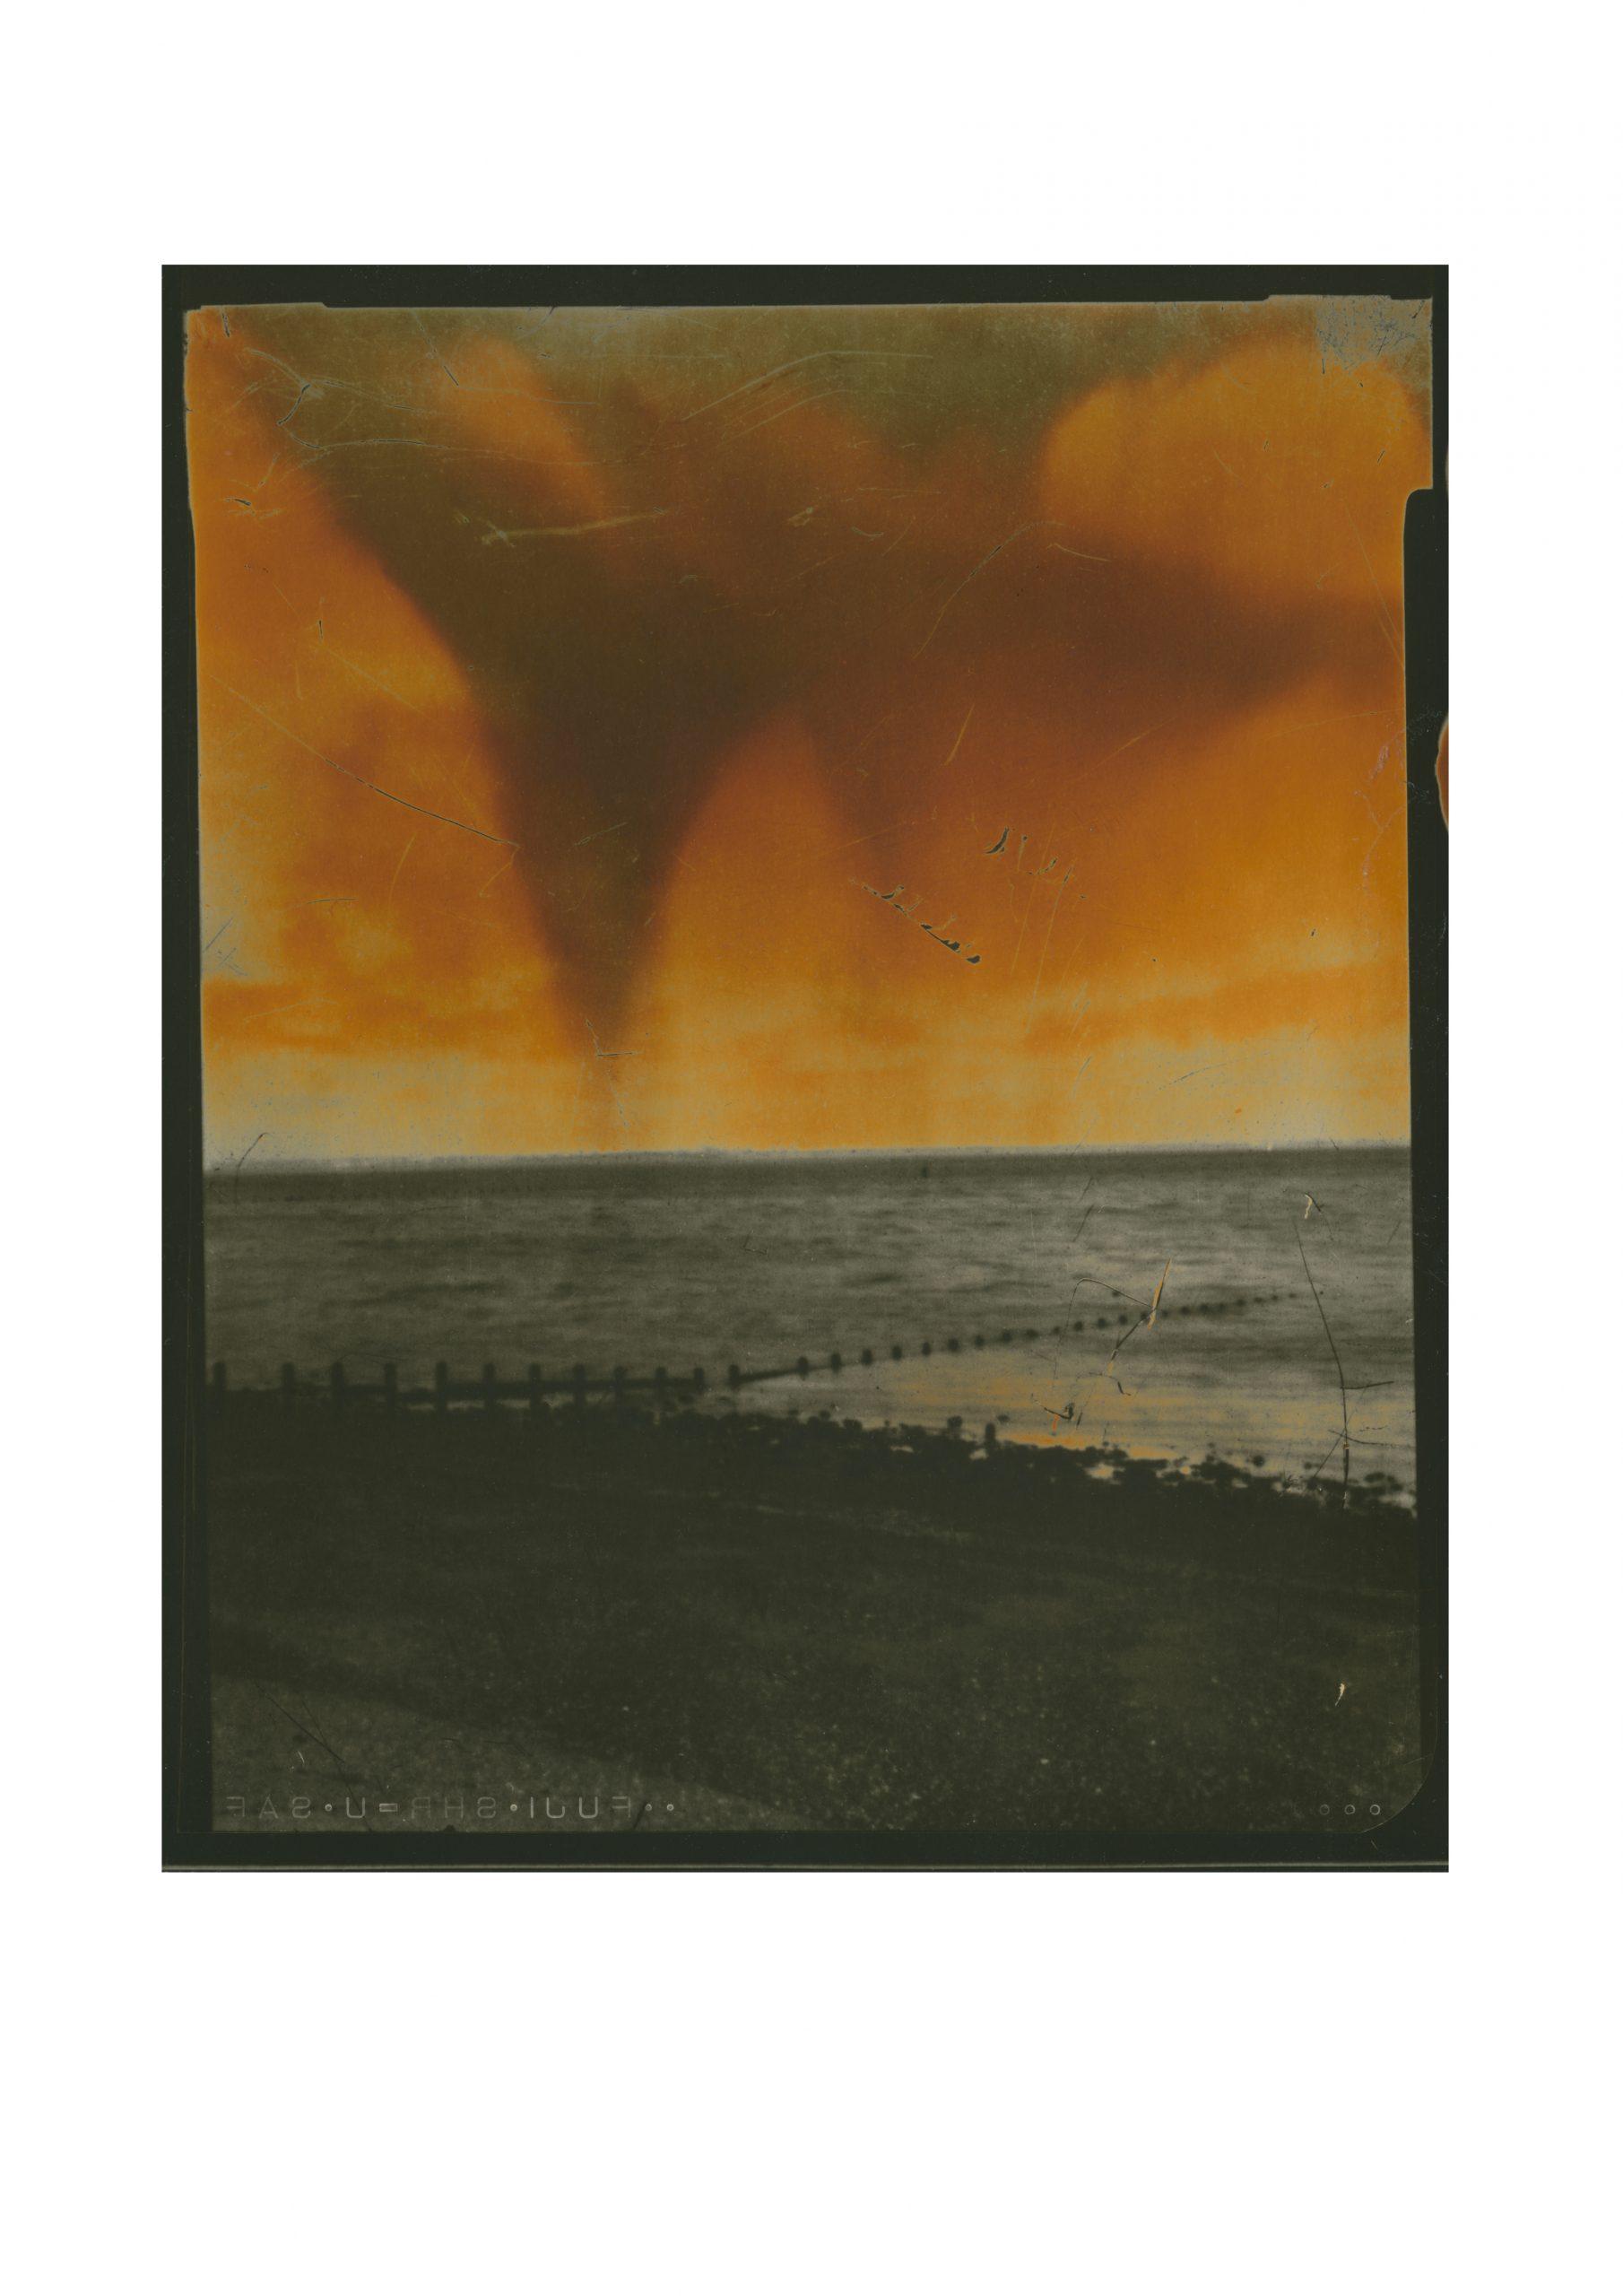 view of the sea lower half shingle and breakwaters top half painted acid orange dramatic sky